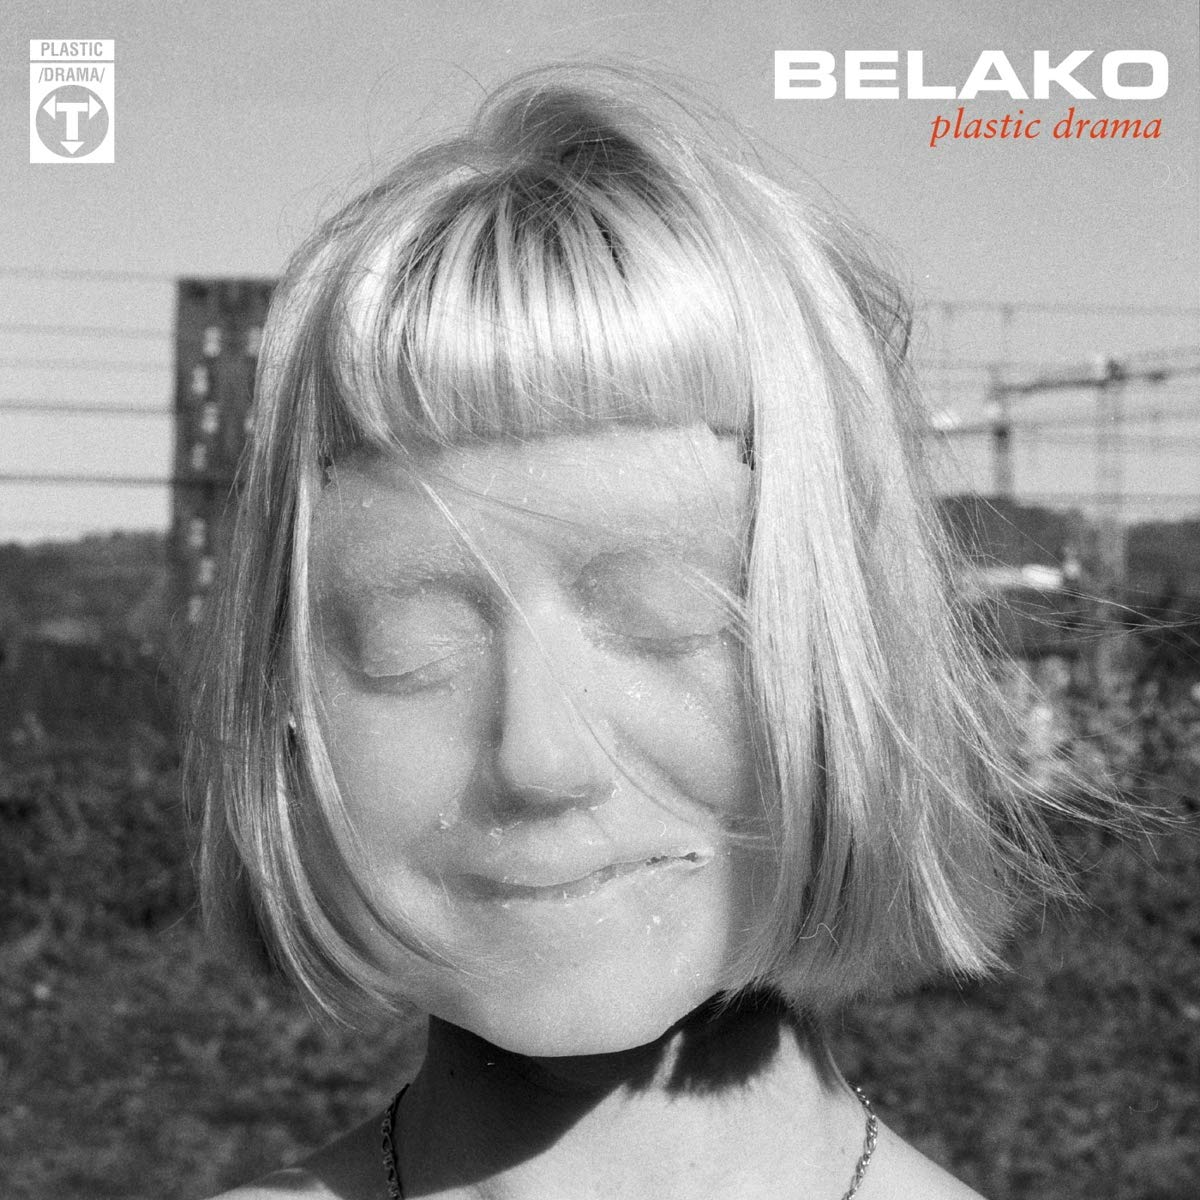 Belako - Plastic Drama (Lp + Póster) Edición Firmada [Vinilo]